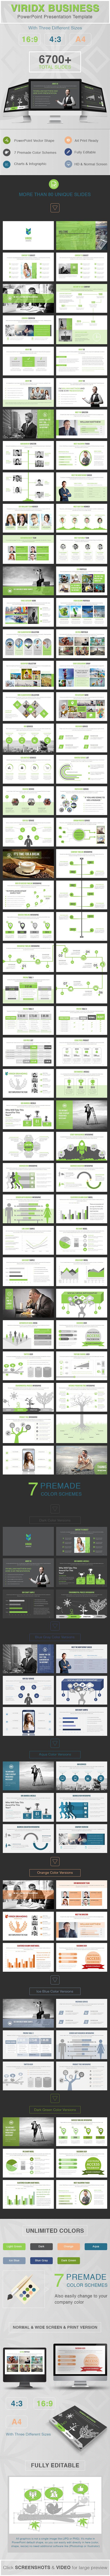 Viridx Business PowerPoint Presentation Template